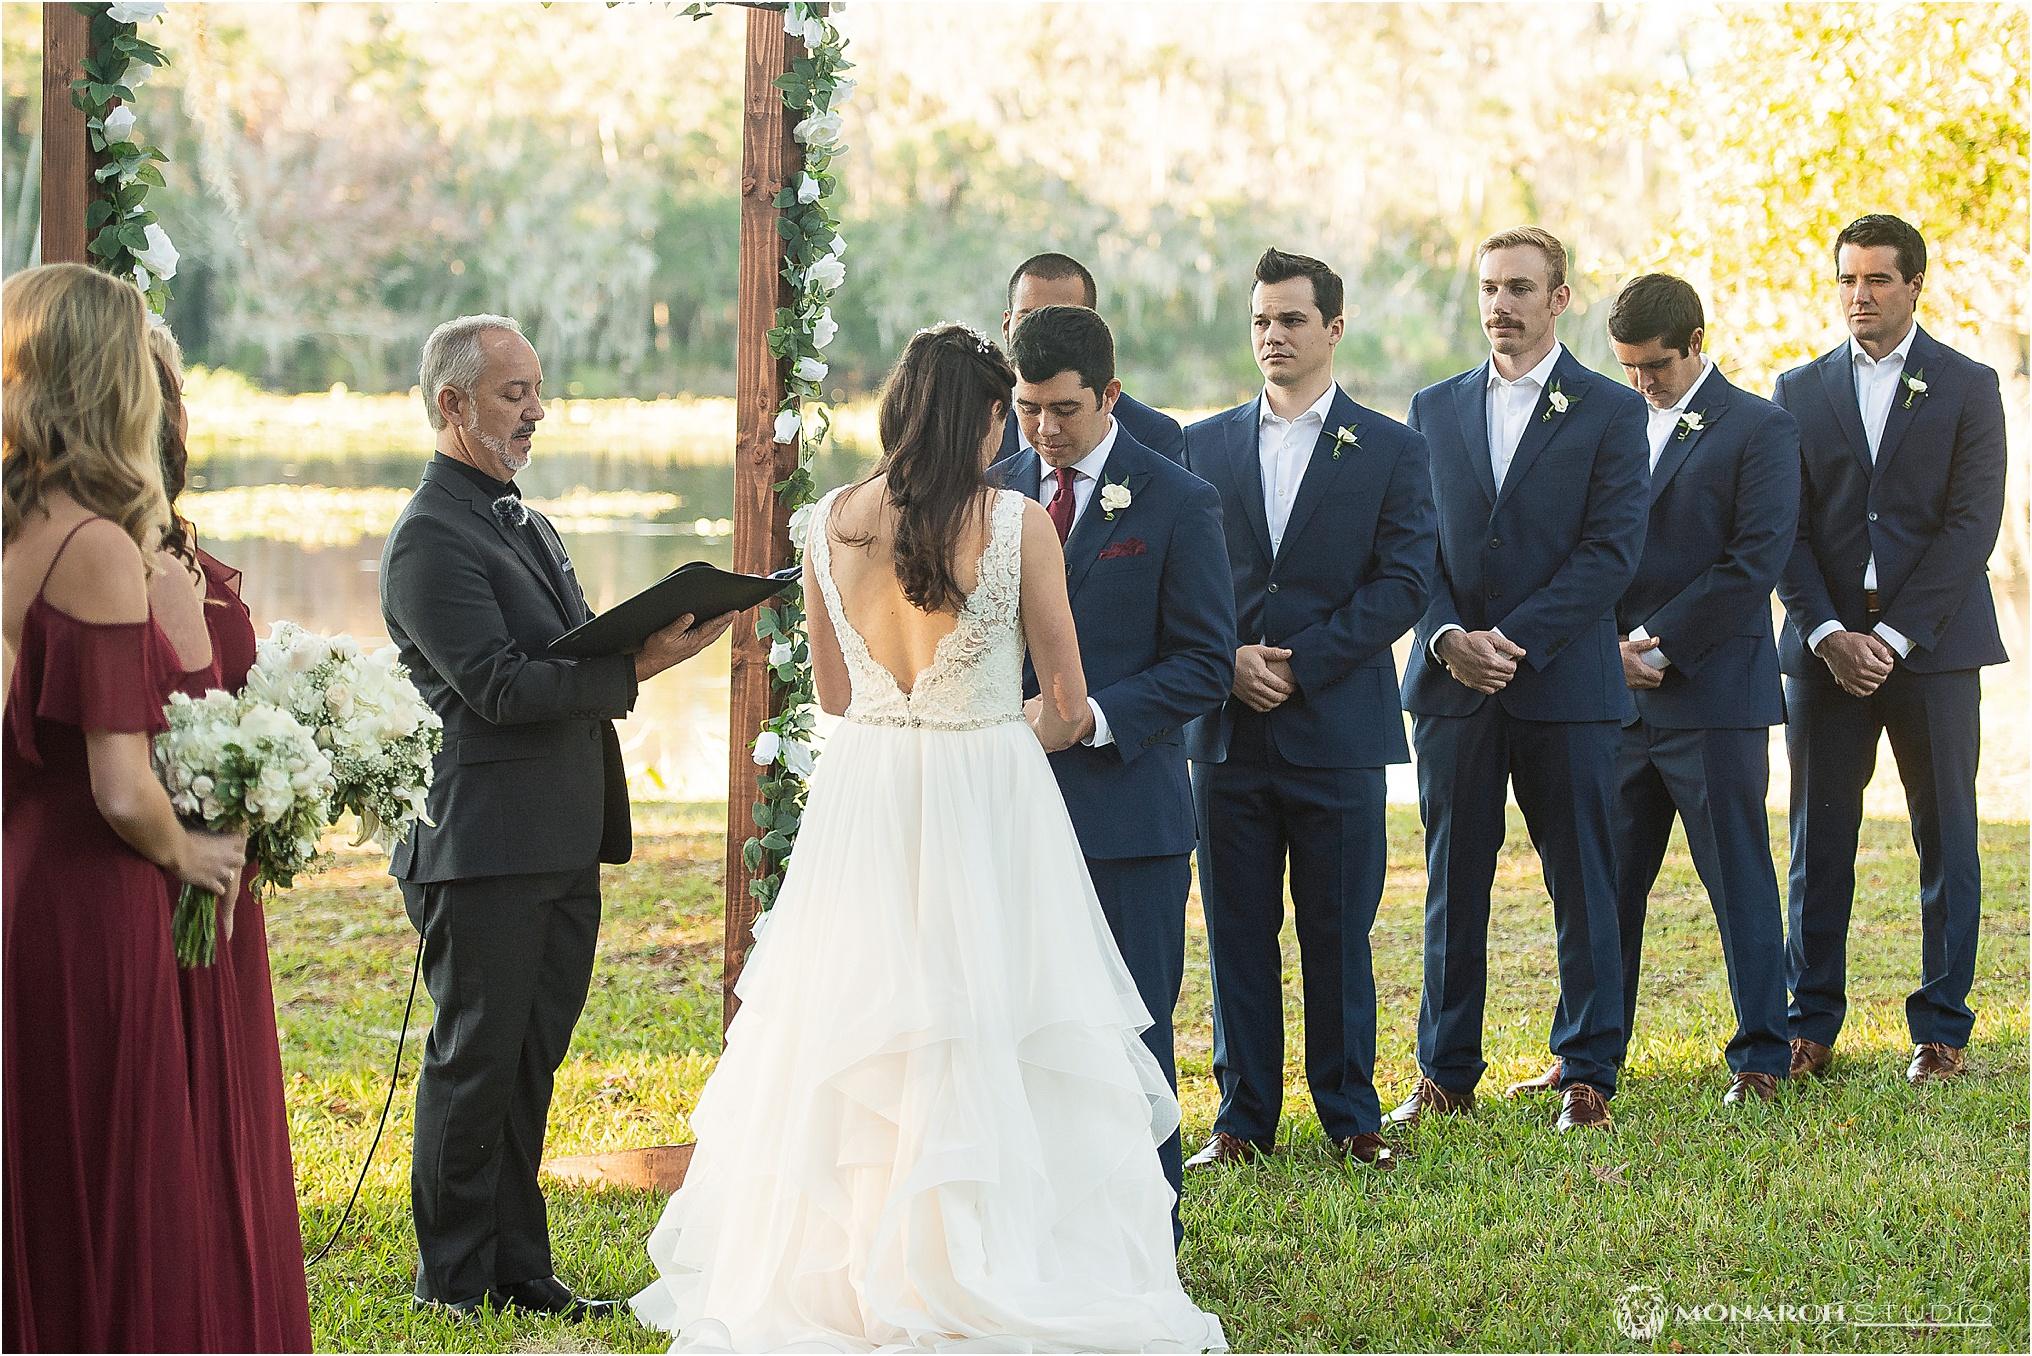 Wedding-photographer-in-sanford-florida-natural-wedding-058.jpg